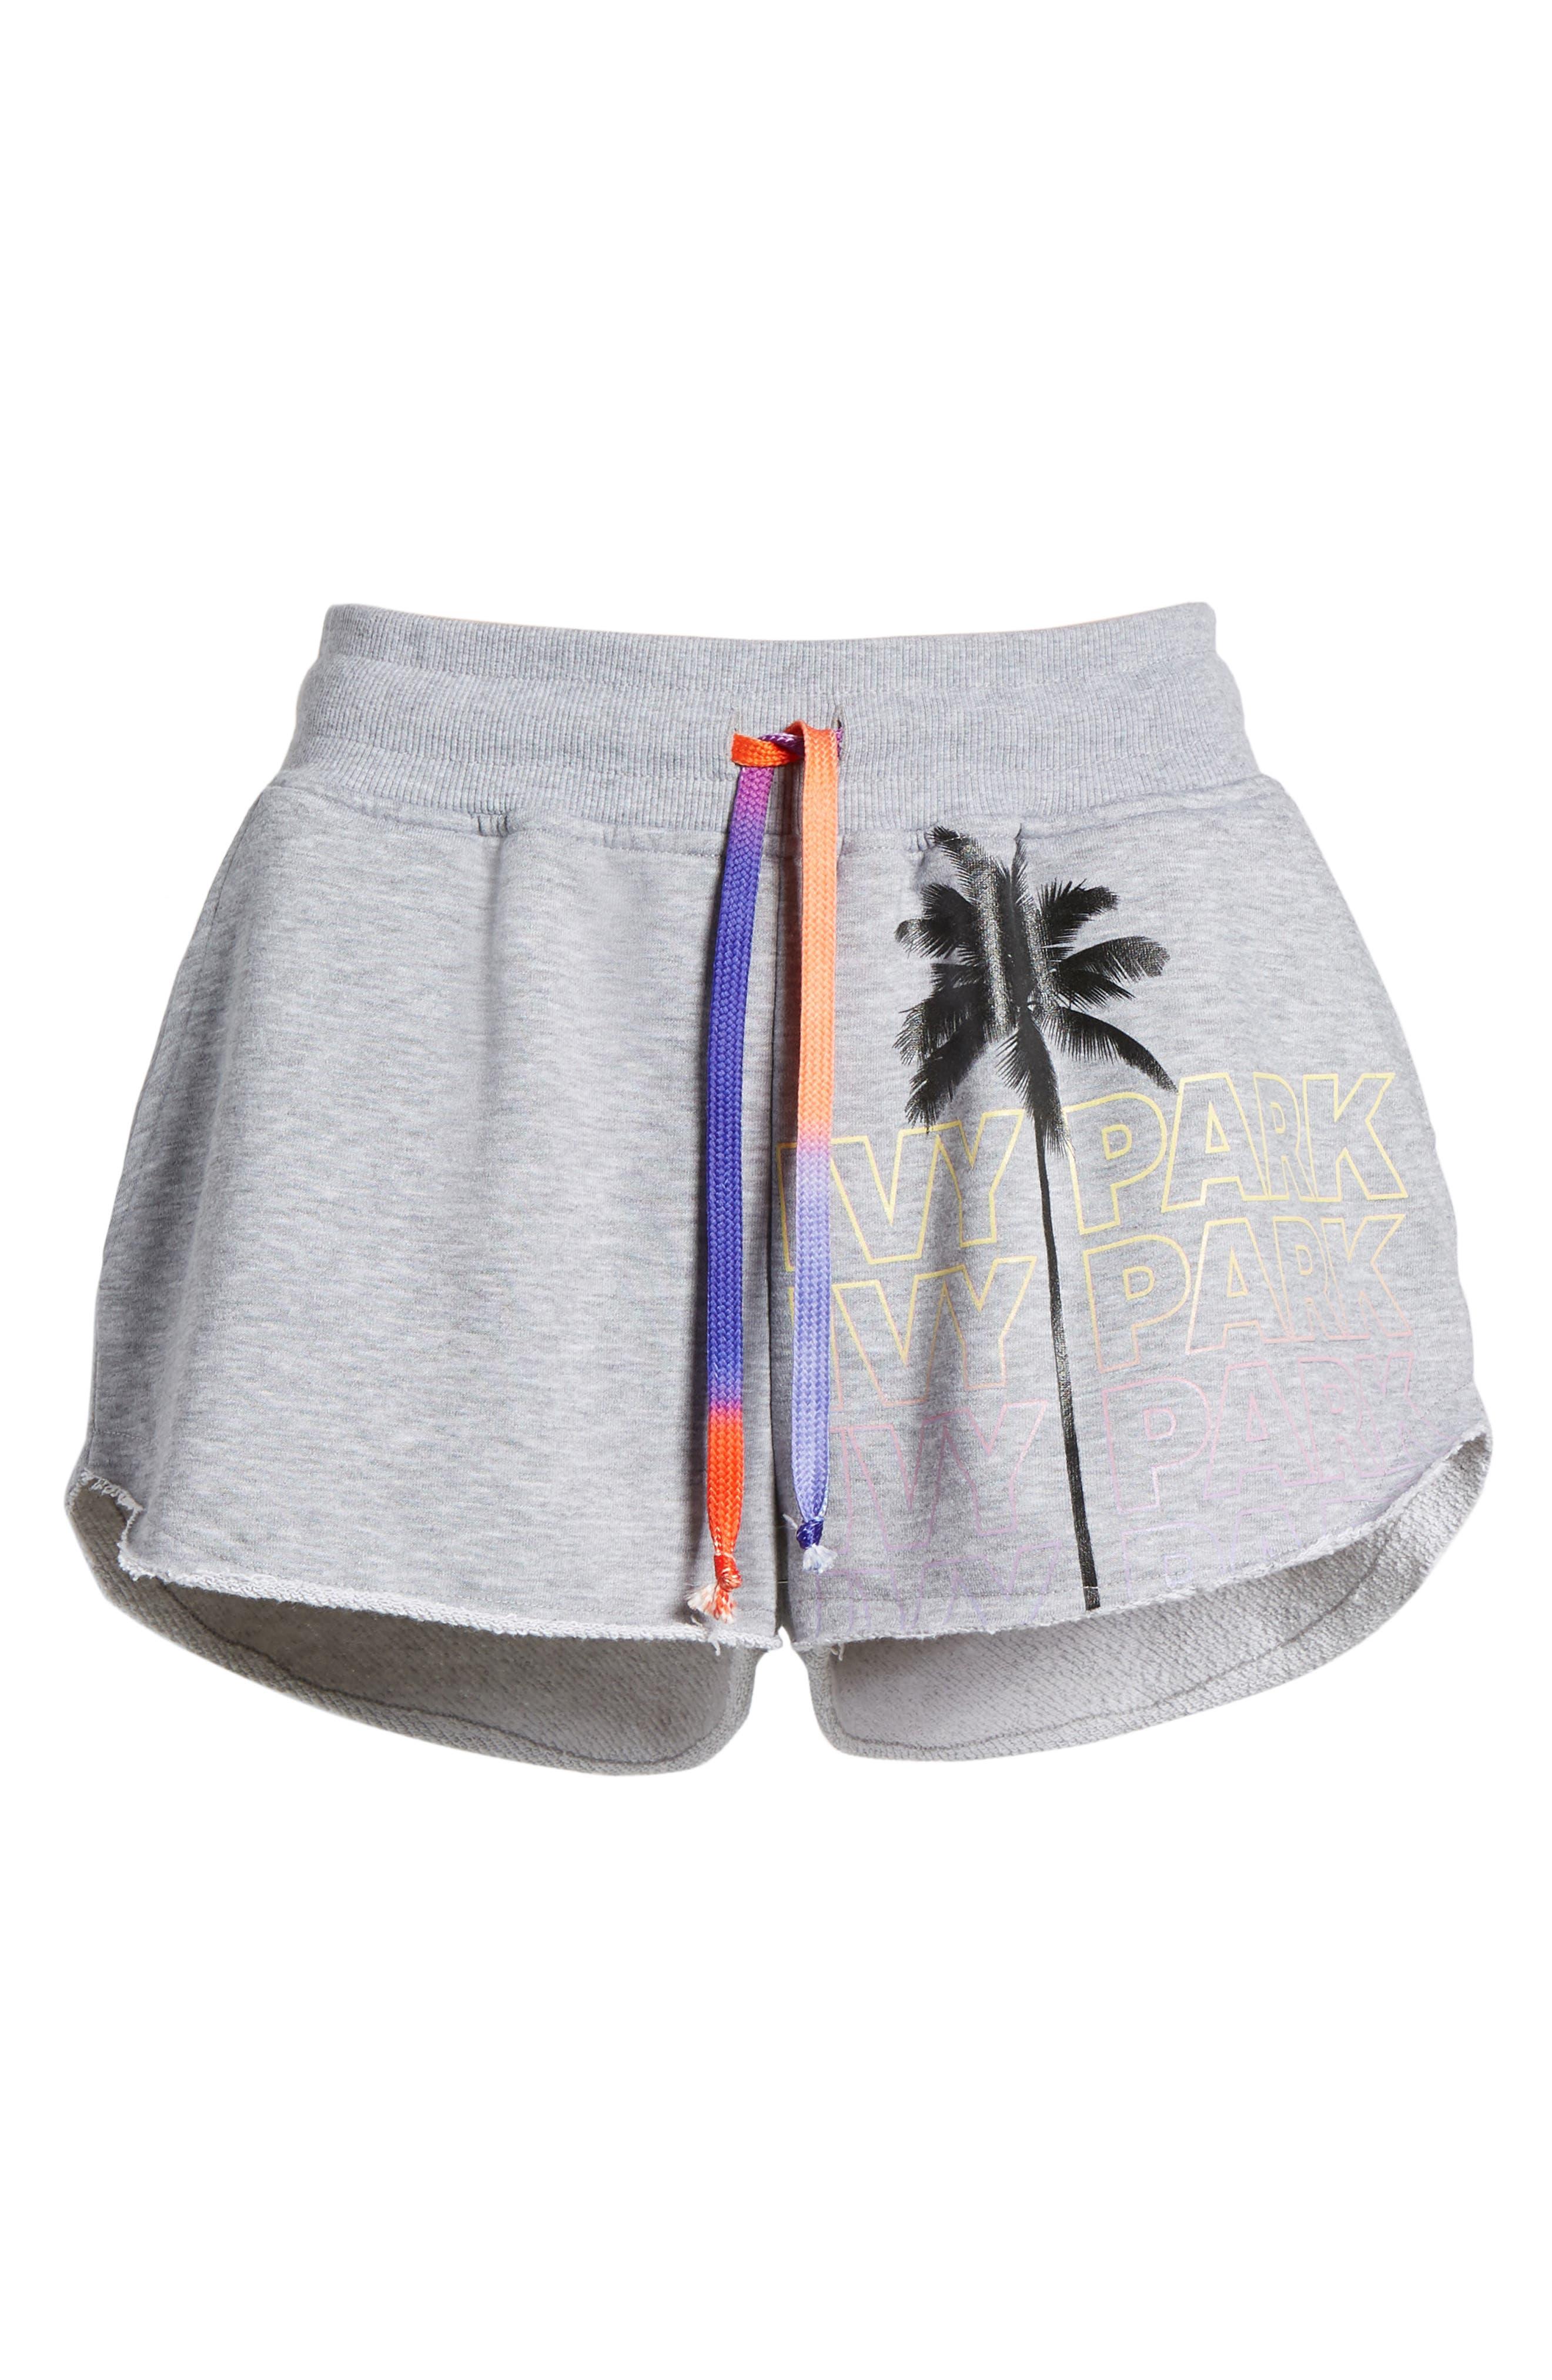 Festival Palm Print Shorts,                             Alternate thumbnail 7, color,                             050